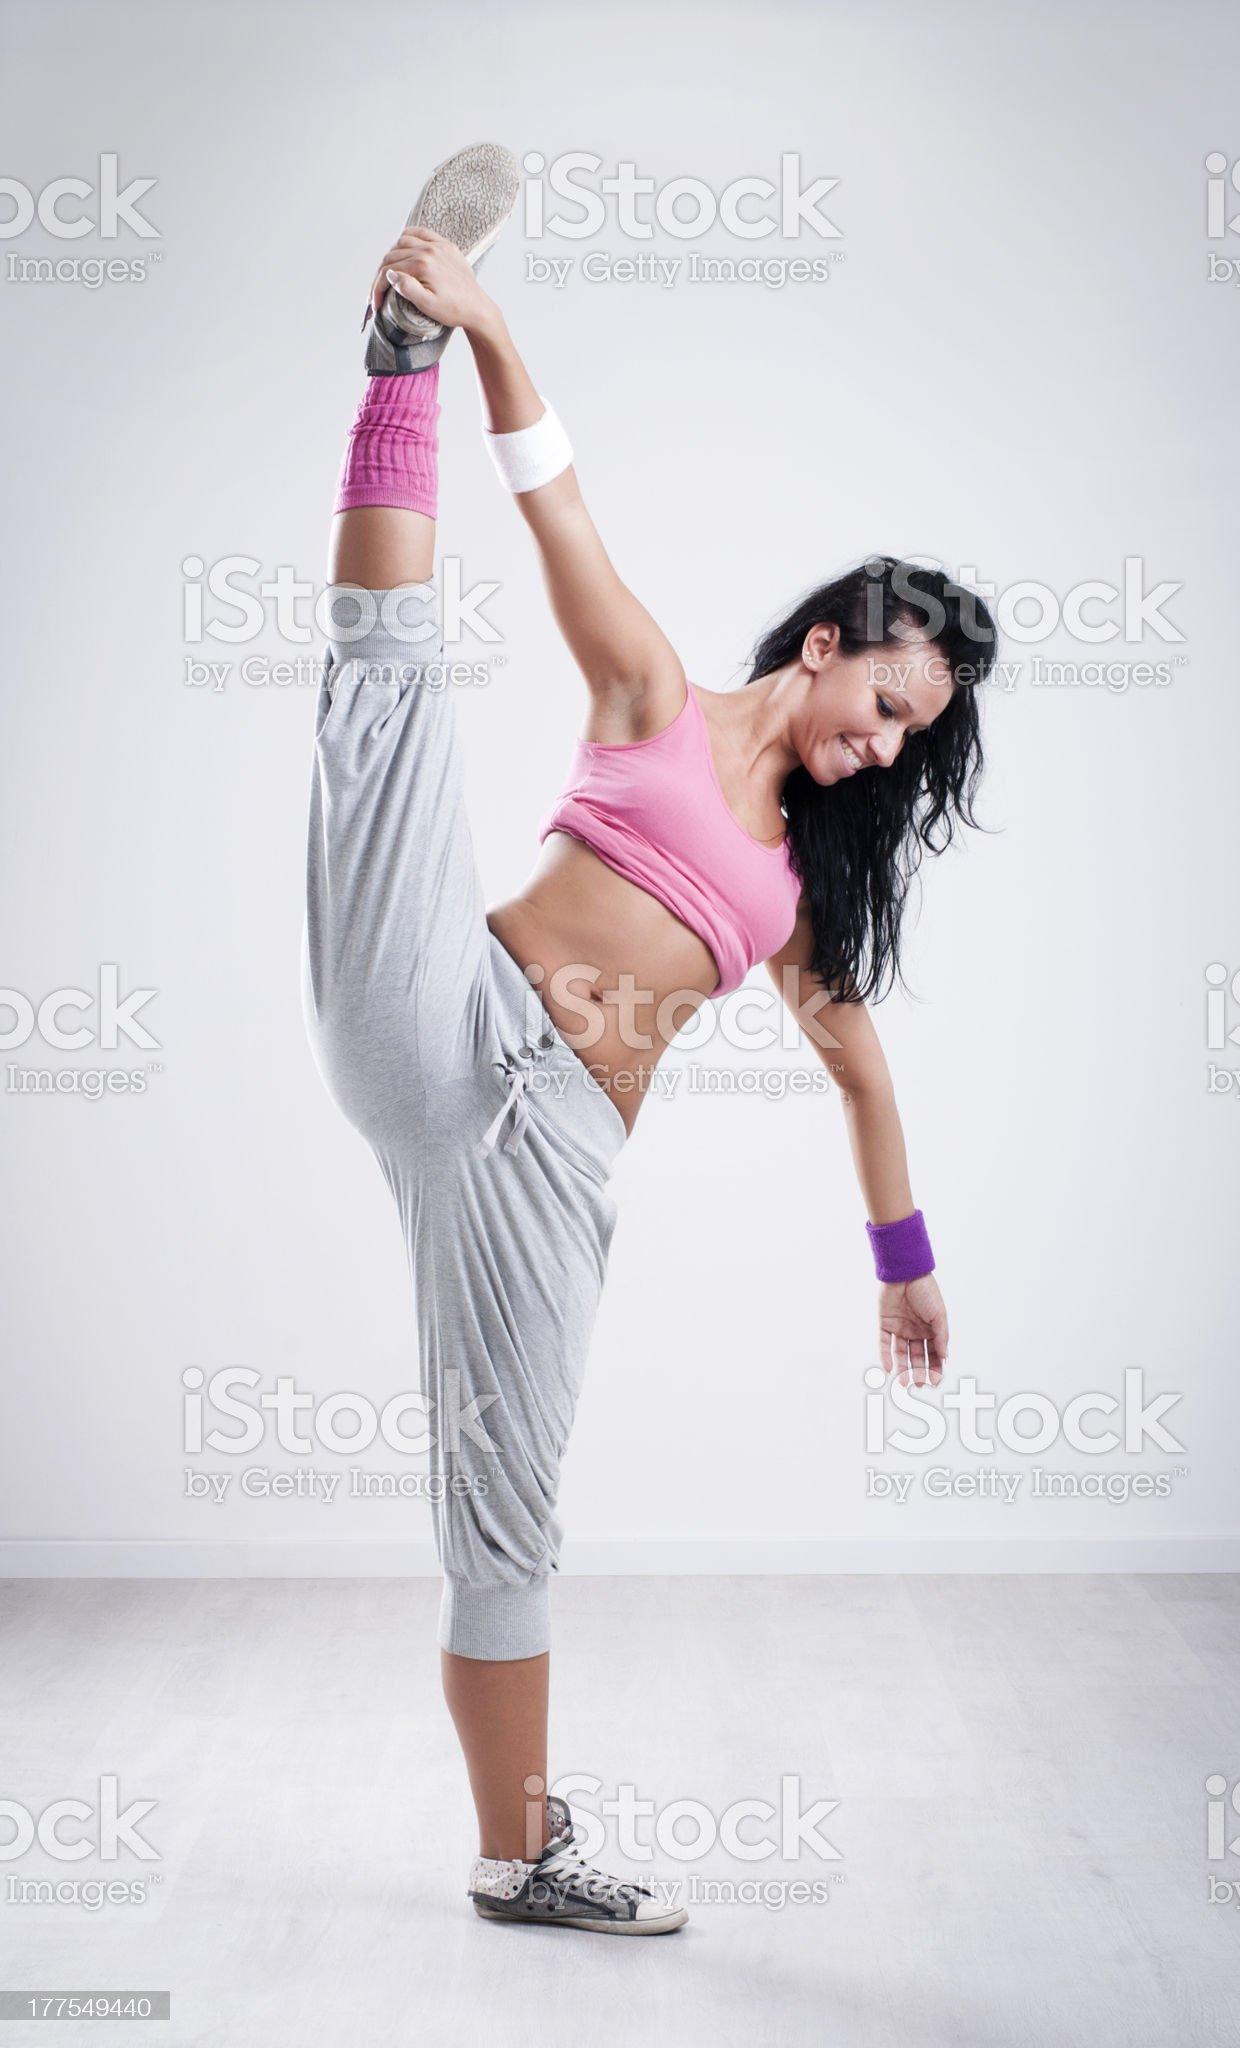 Female dancer stretching her leg royalty-free stock photo